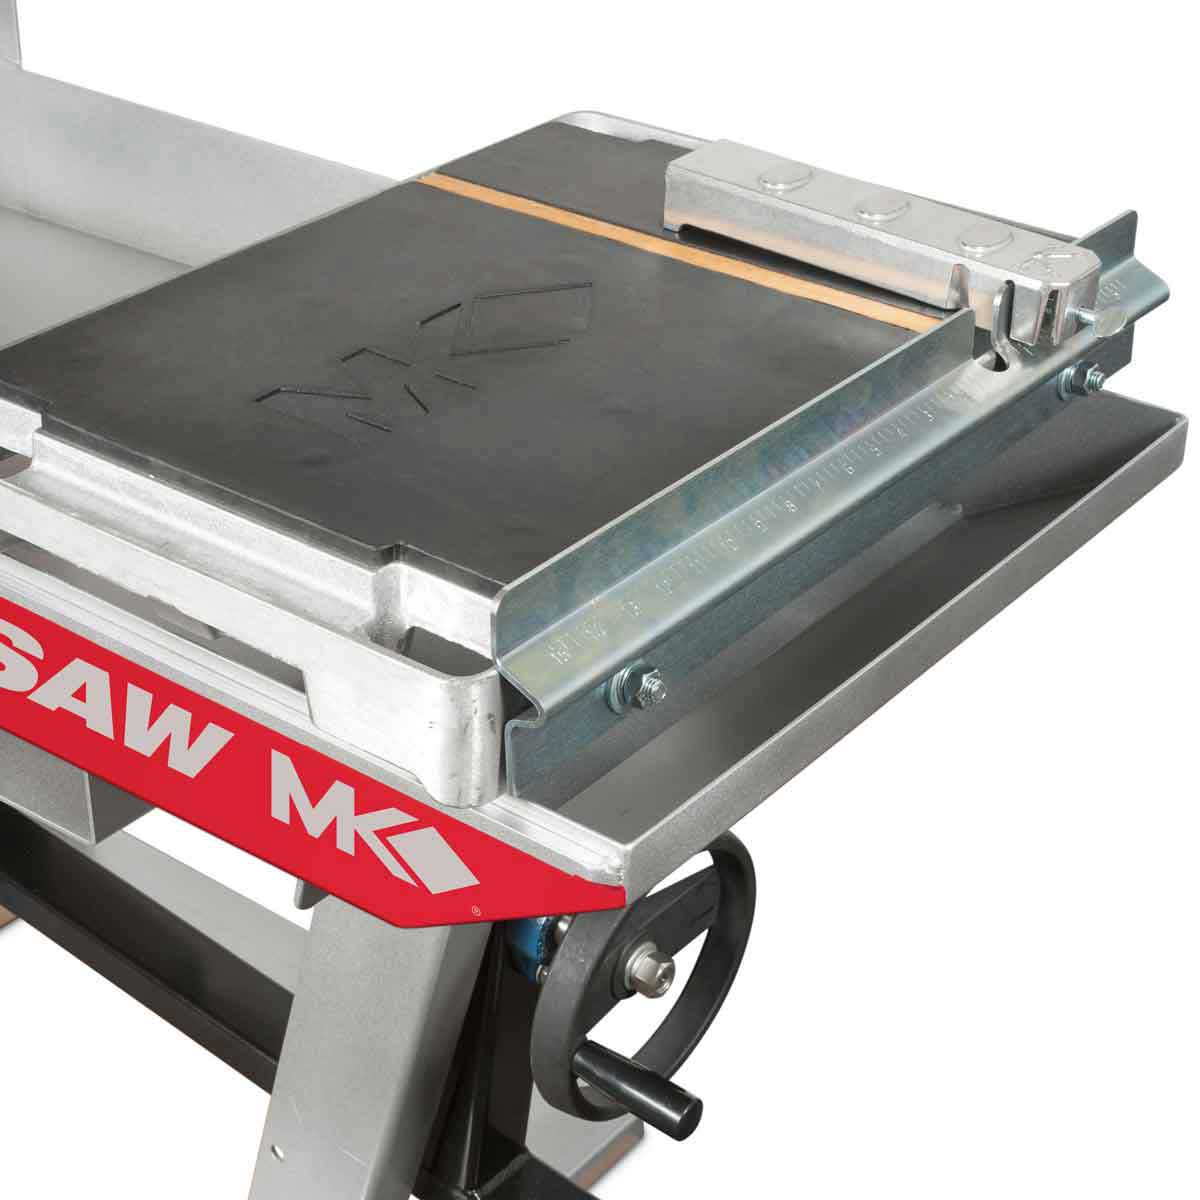 MK MX-5 Block Saw Cutting Cart